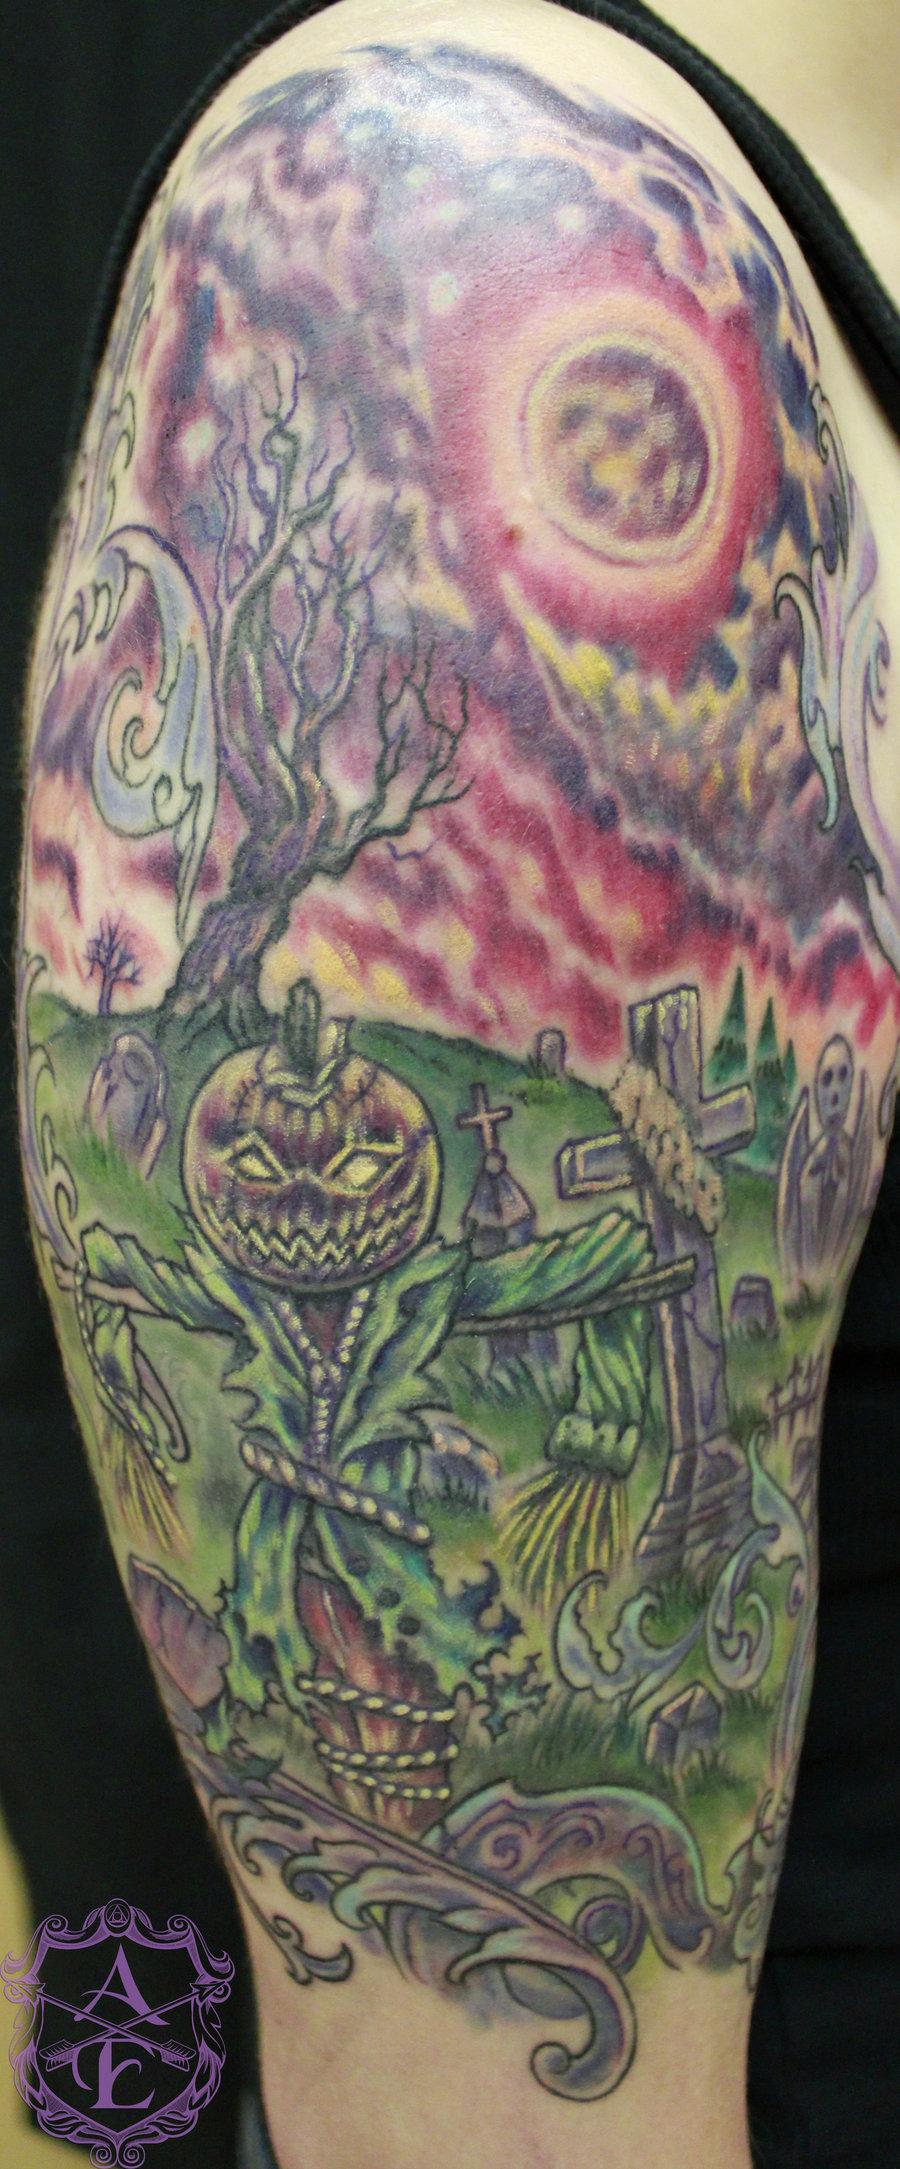 Cemetery and graveyard tattoo on half sleeve - Halloween Graveyard Tattoo On Right Half Sleeve